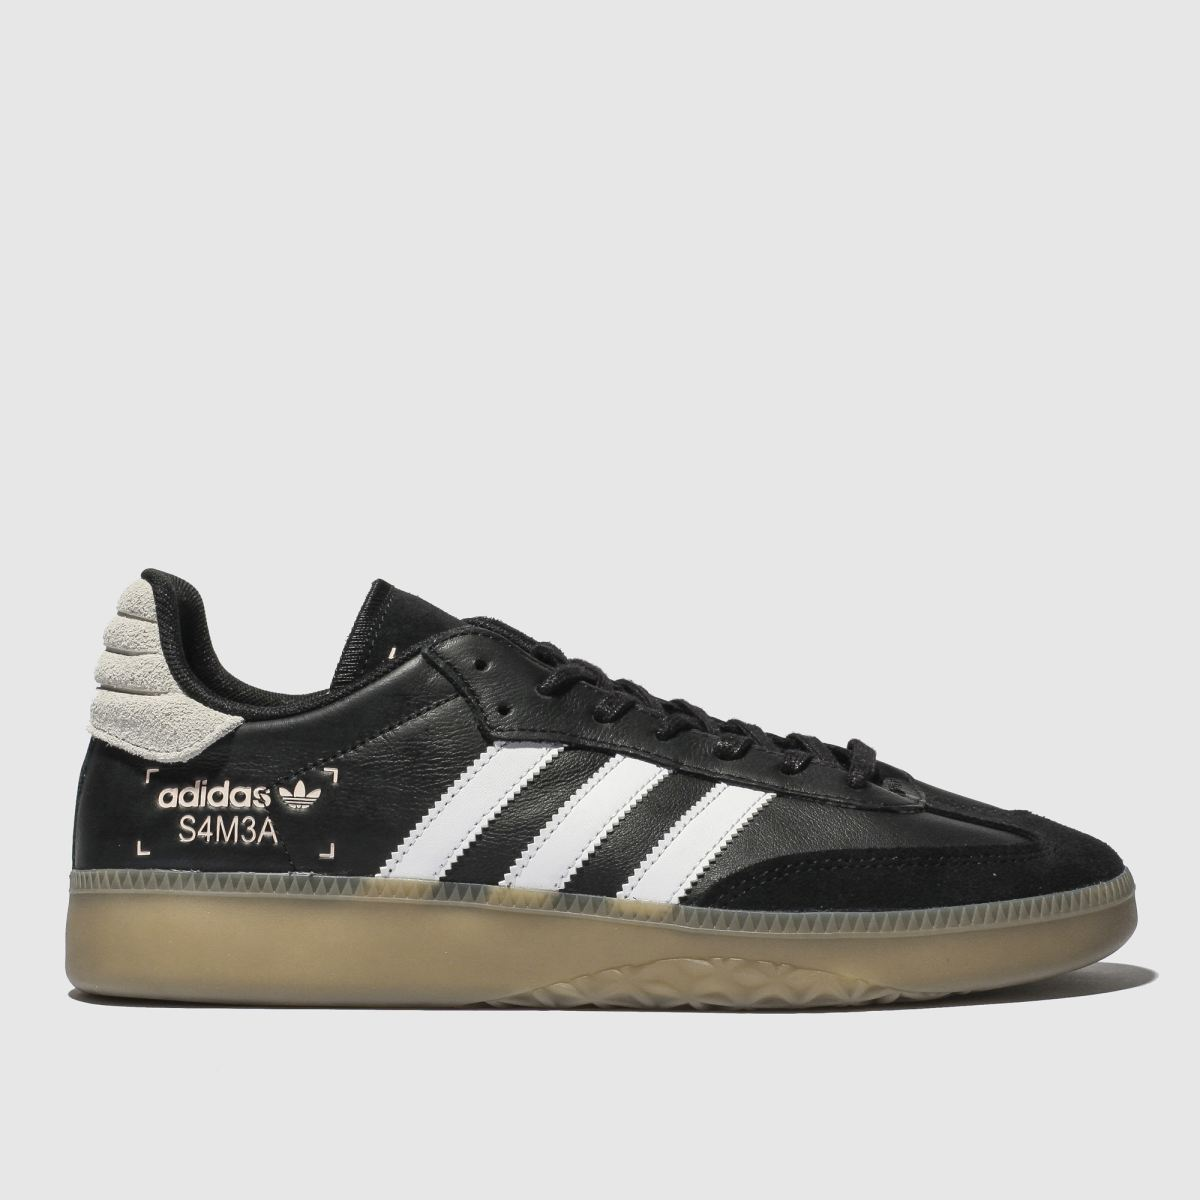 Adidas Black & White Samba Rm Trainers